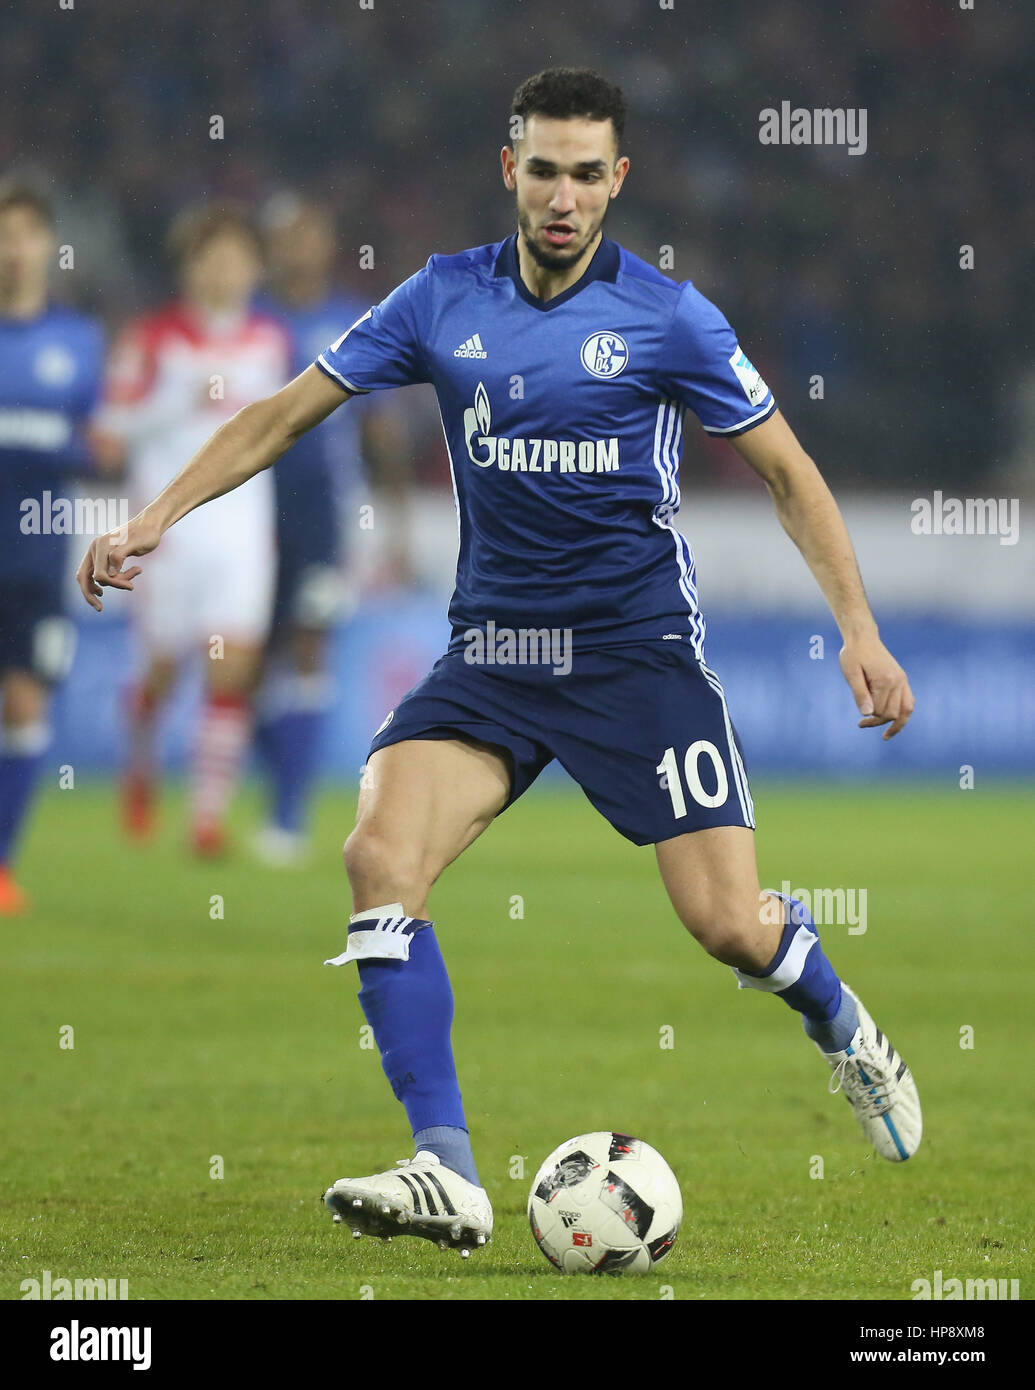 Cologne, Germany, February 19, 2017, Bundesliga matchday 21, 1. FC Koeln - FC Schalke 04:  Nabil Bentaleb (Schalke) - Stock Image